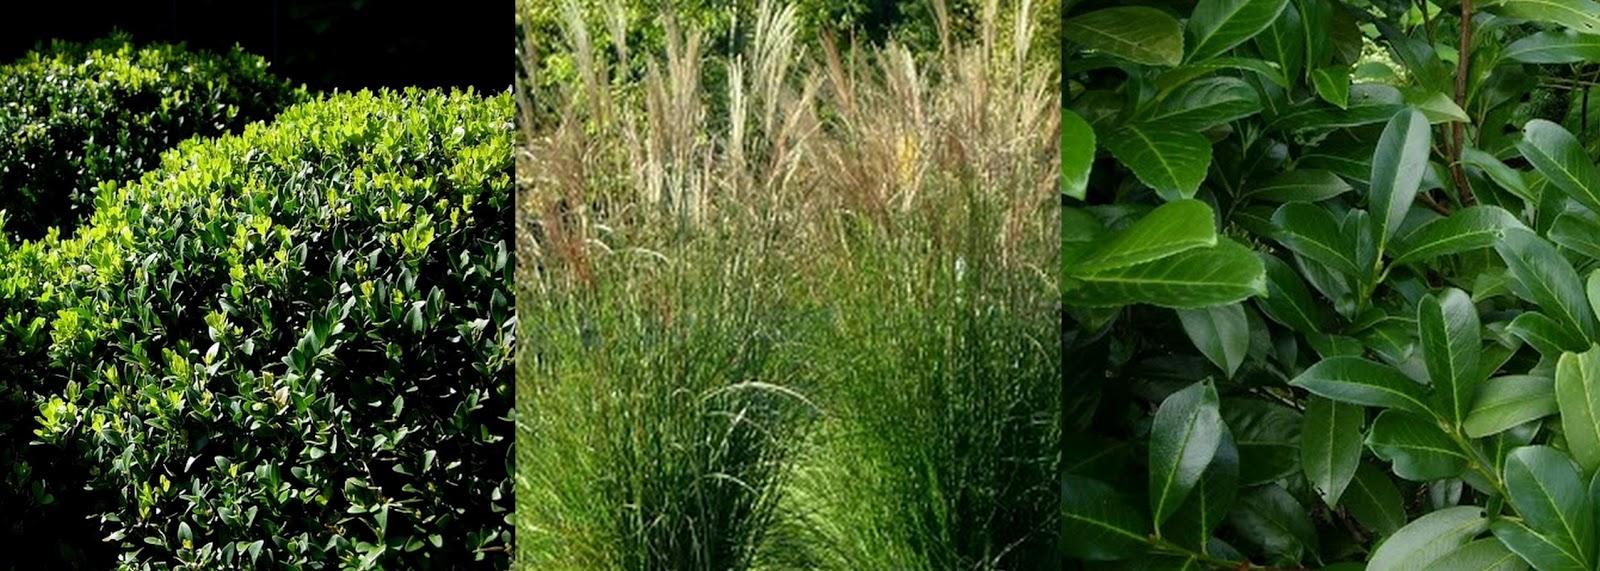 Gartendeko blog gartenideen pflanzen als dekoelemente - Gartenideen pflanzen ...